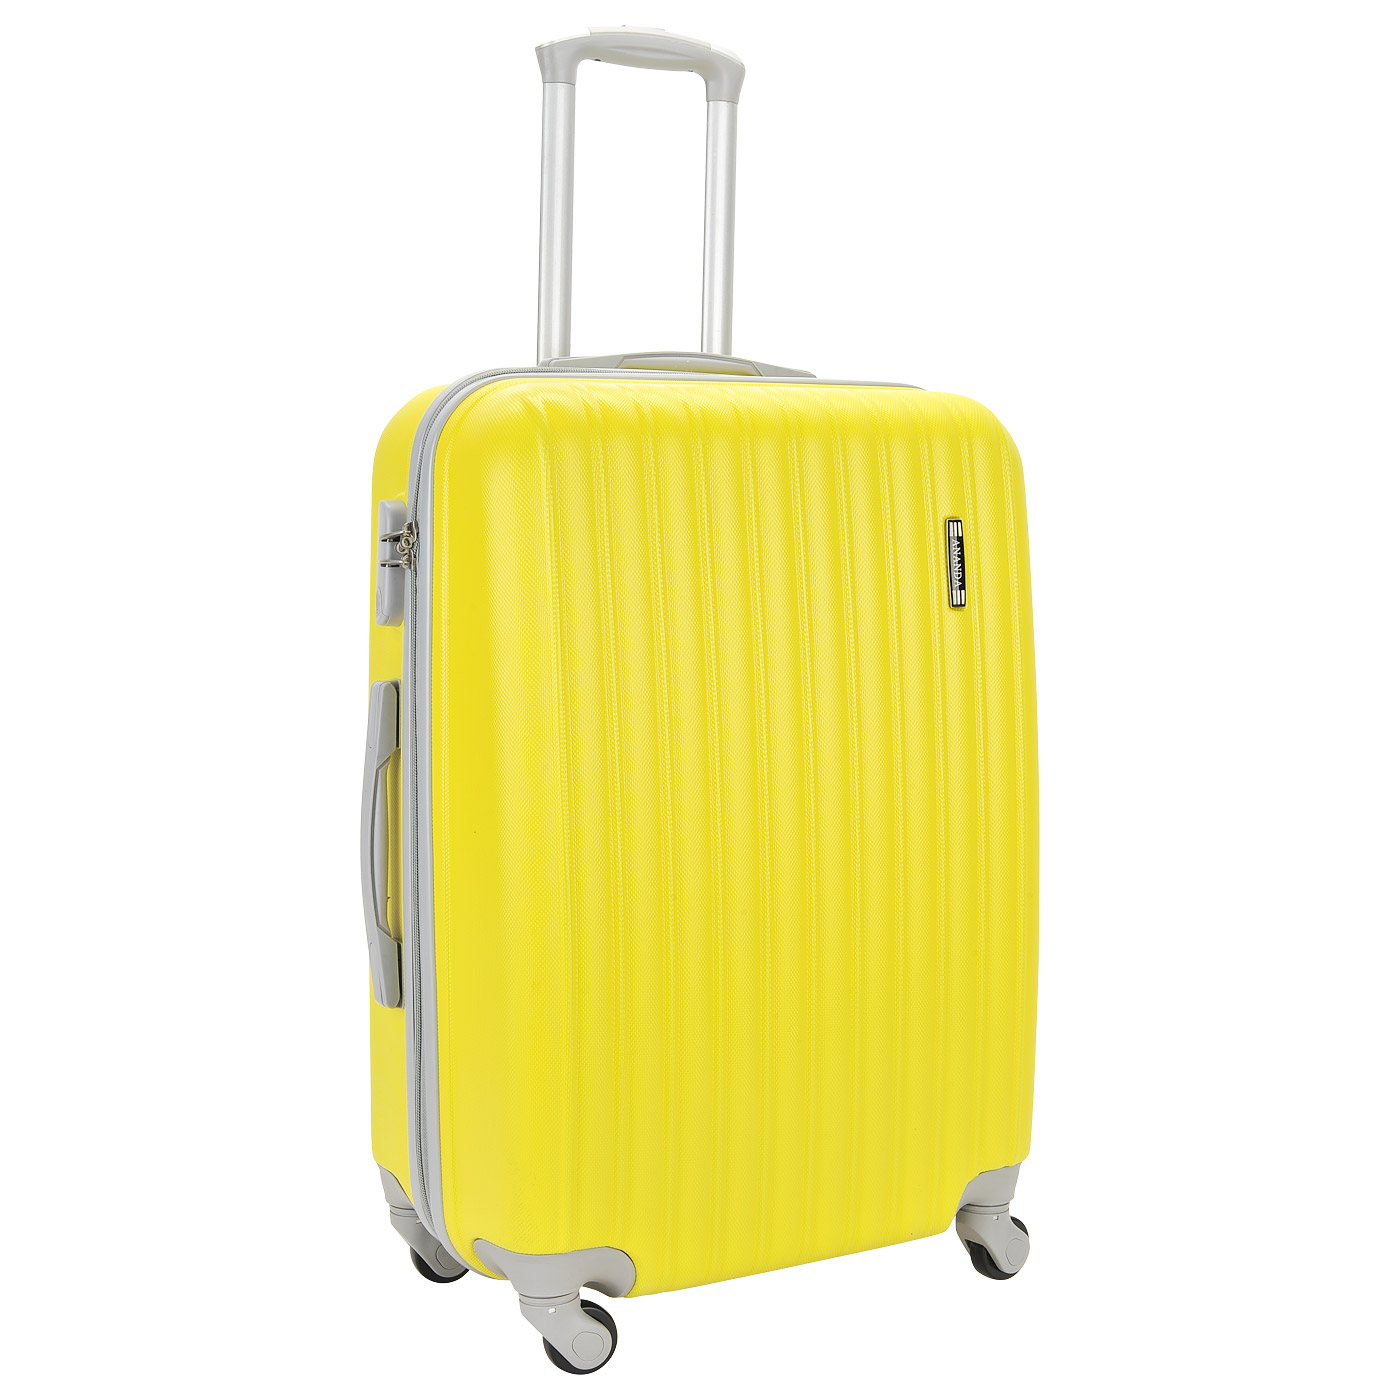 Чемодан на колесах MyxBag MXB-yellow-M-i - 2000557764415 желтый ABS ... 05a593812a0